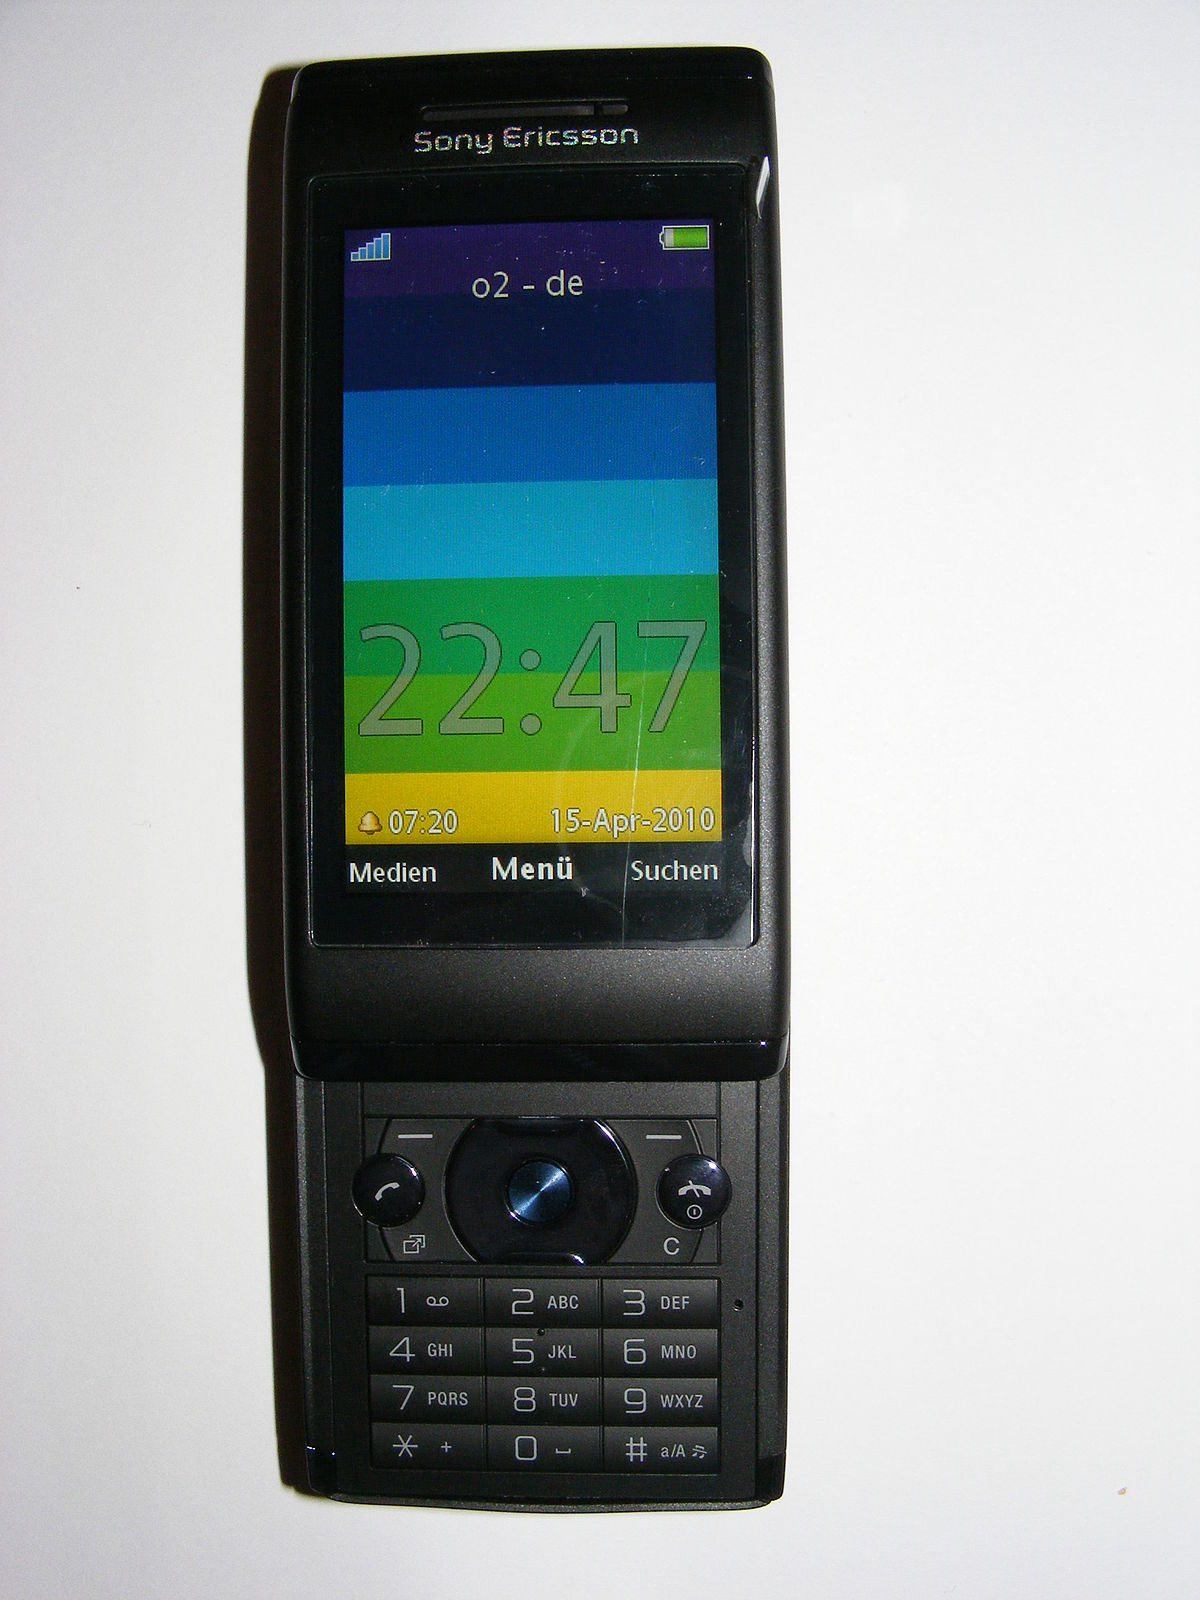 Sony Ericsson Aino Wikipedia